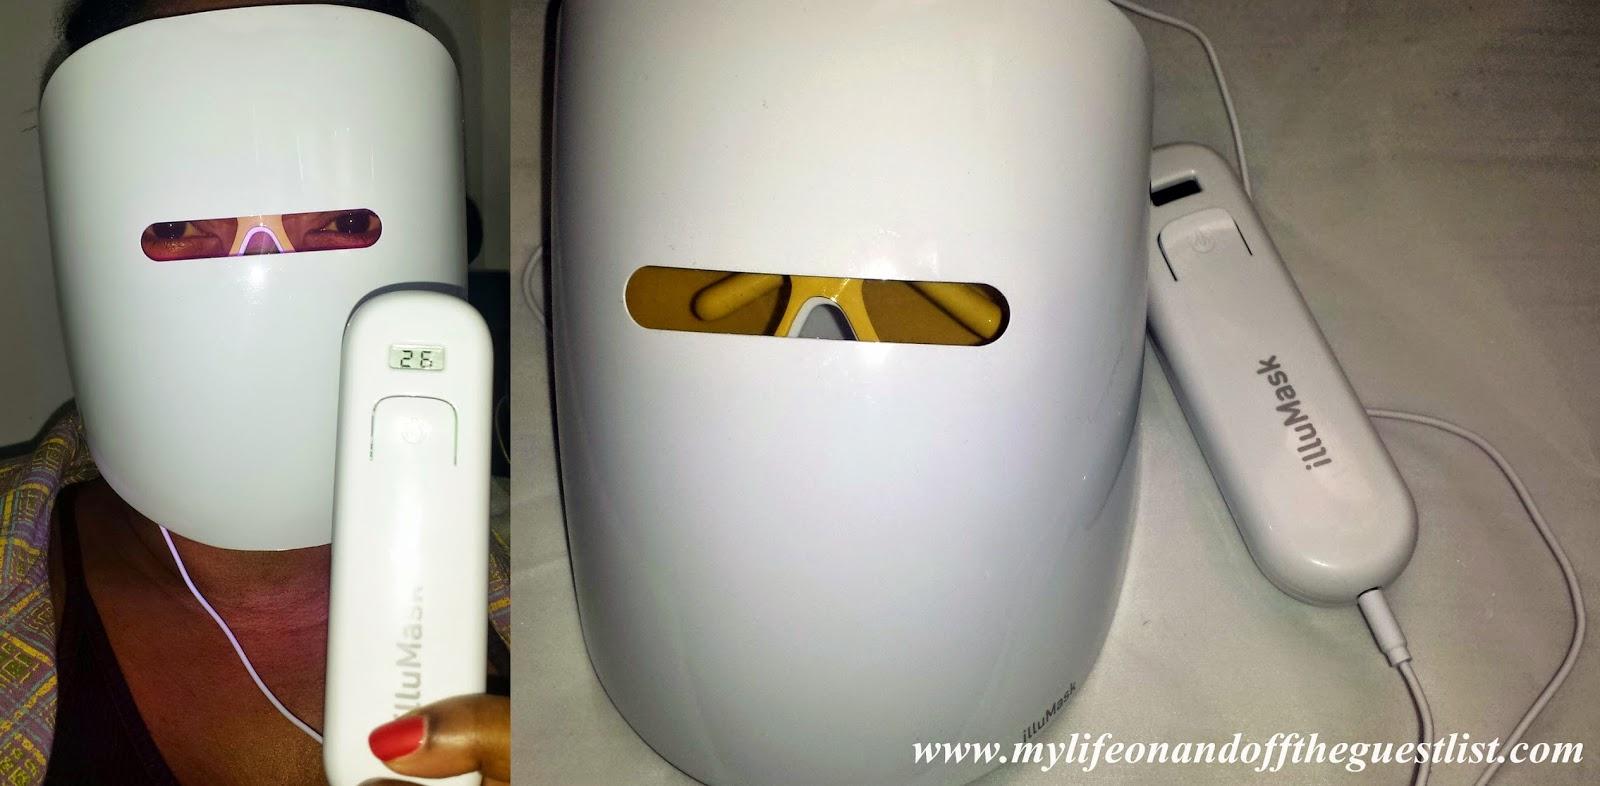 What Weu0027re Loving | IlluMask Anti Acne Light Therapy Mask